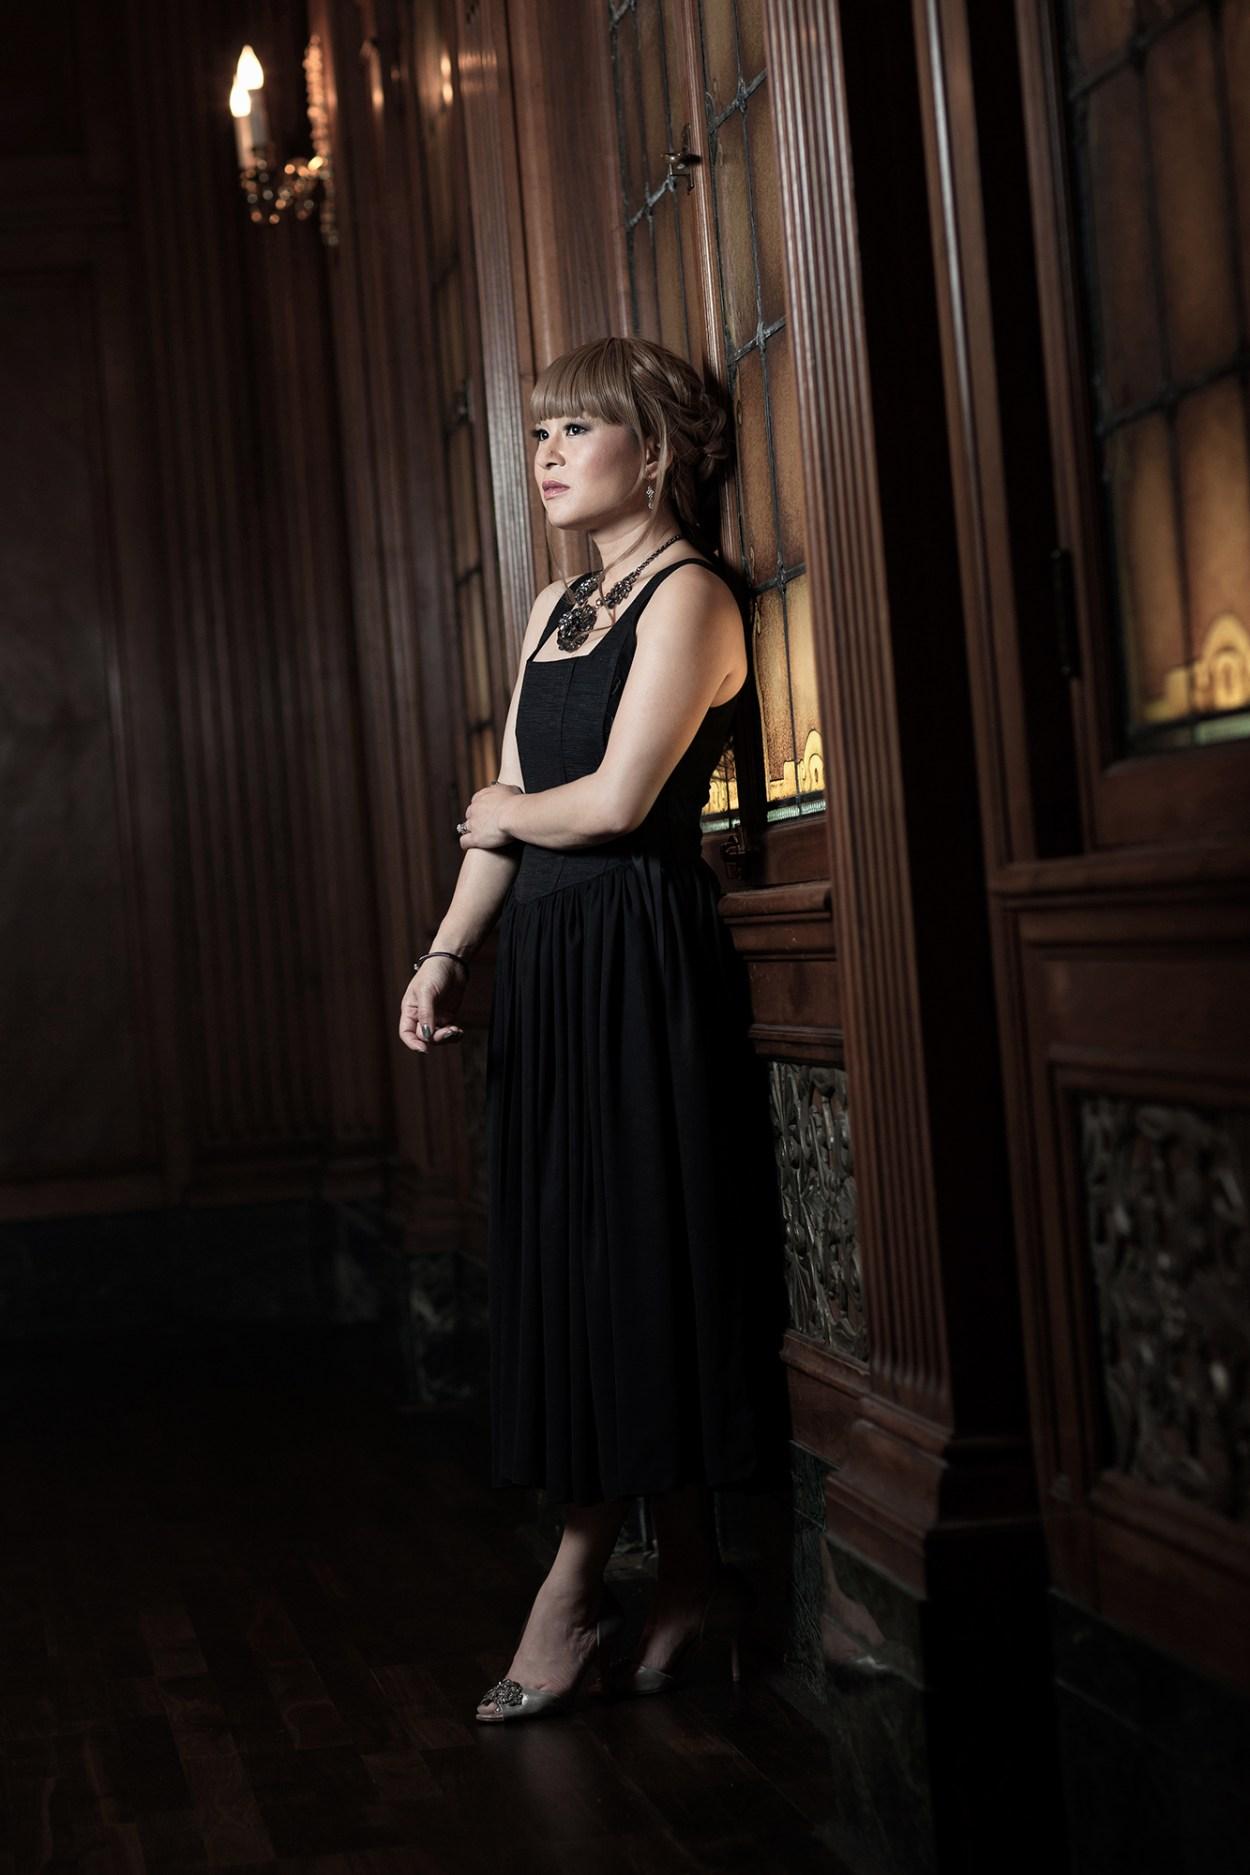 11-Elements-H-Lolita-Stlye-Fashion-Elegant-Gothic